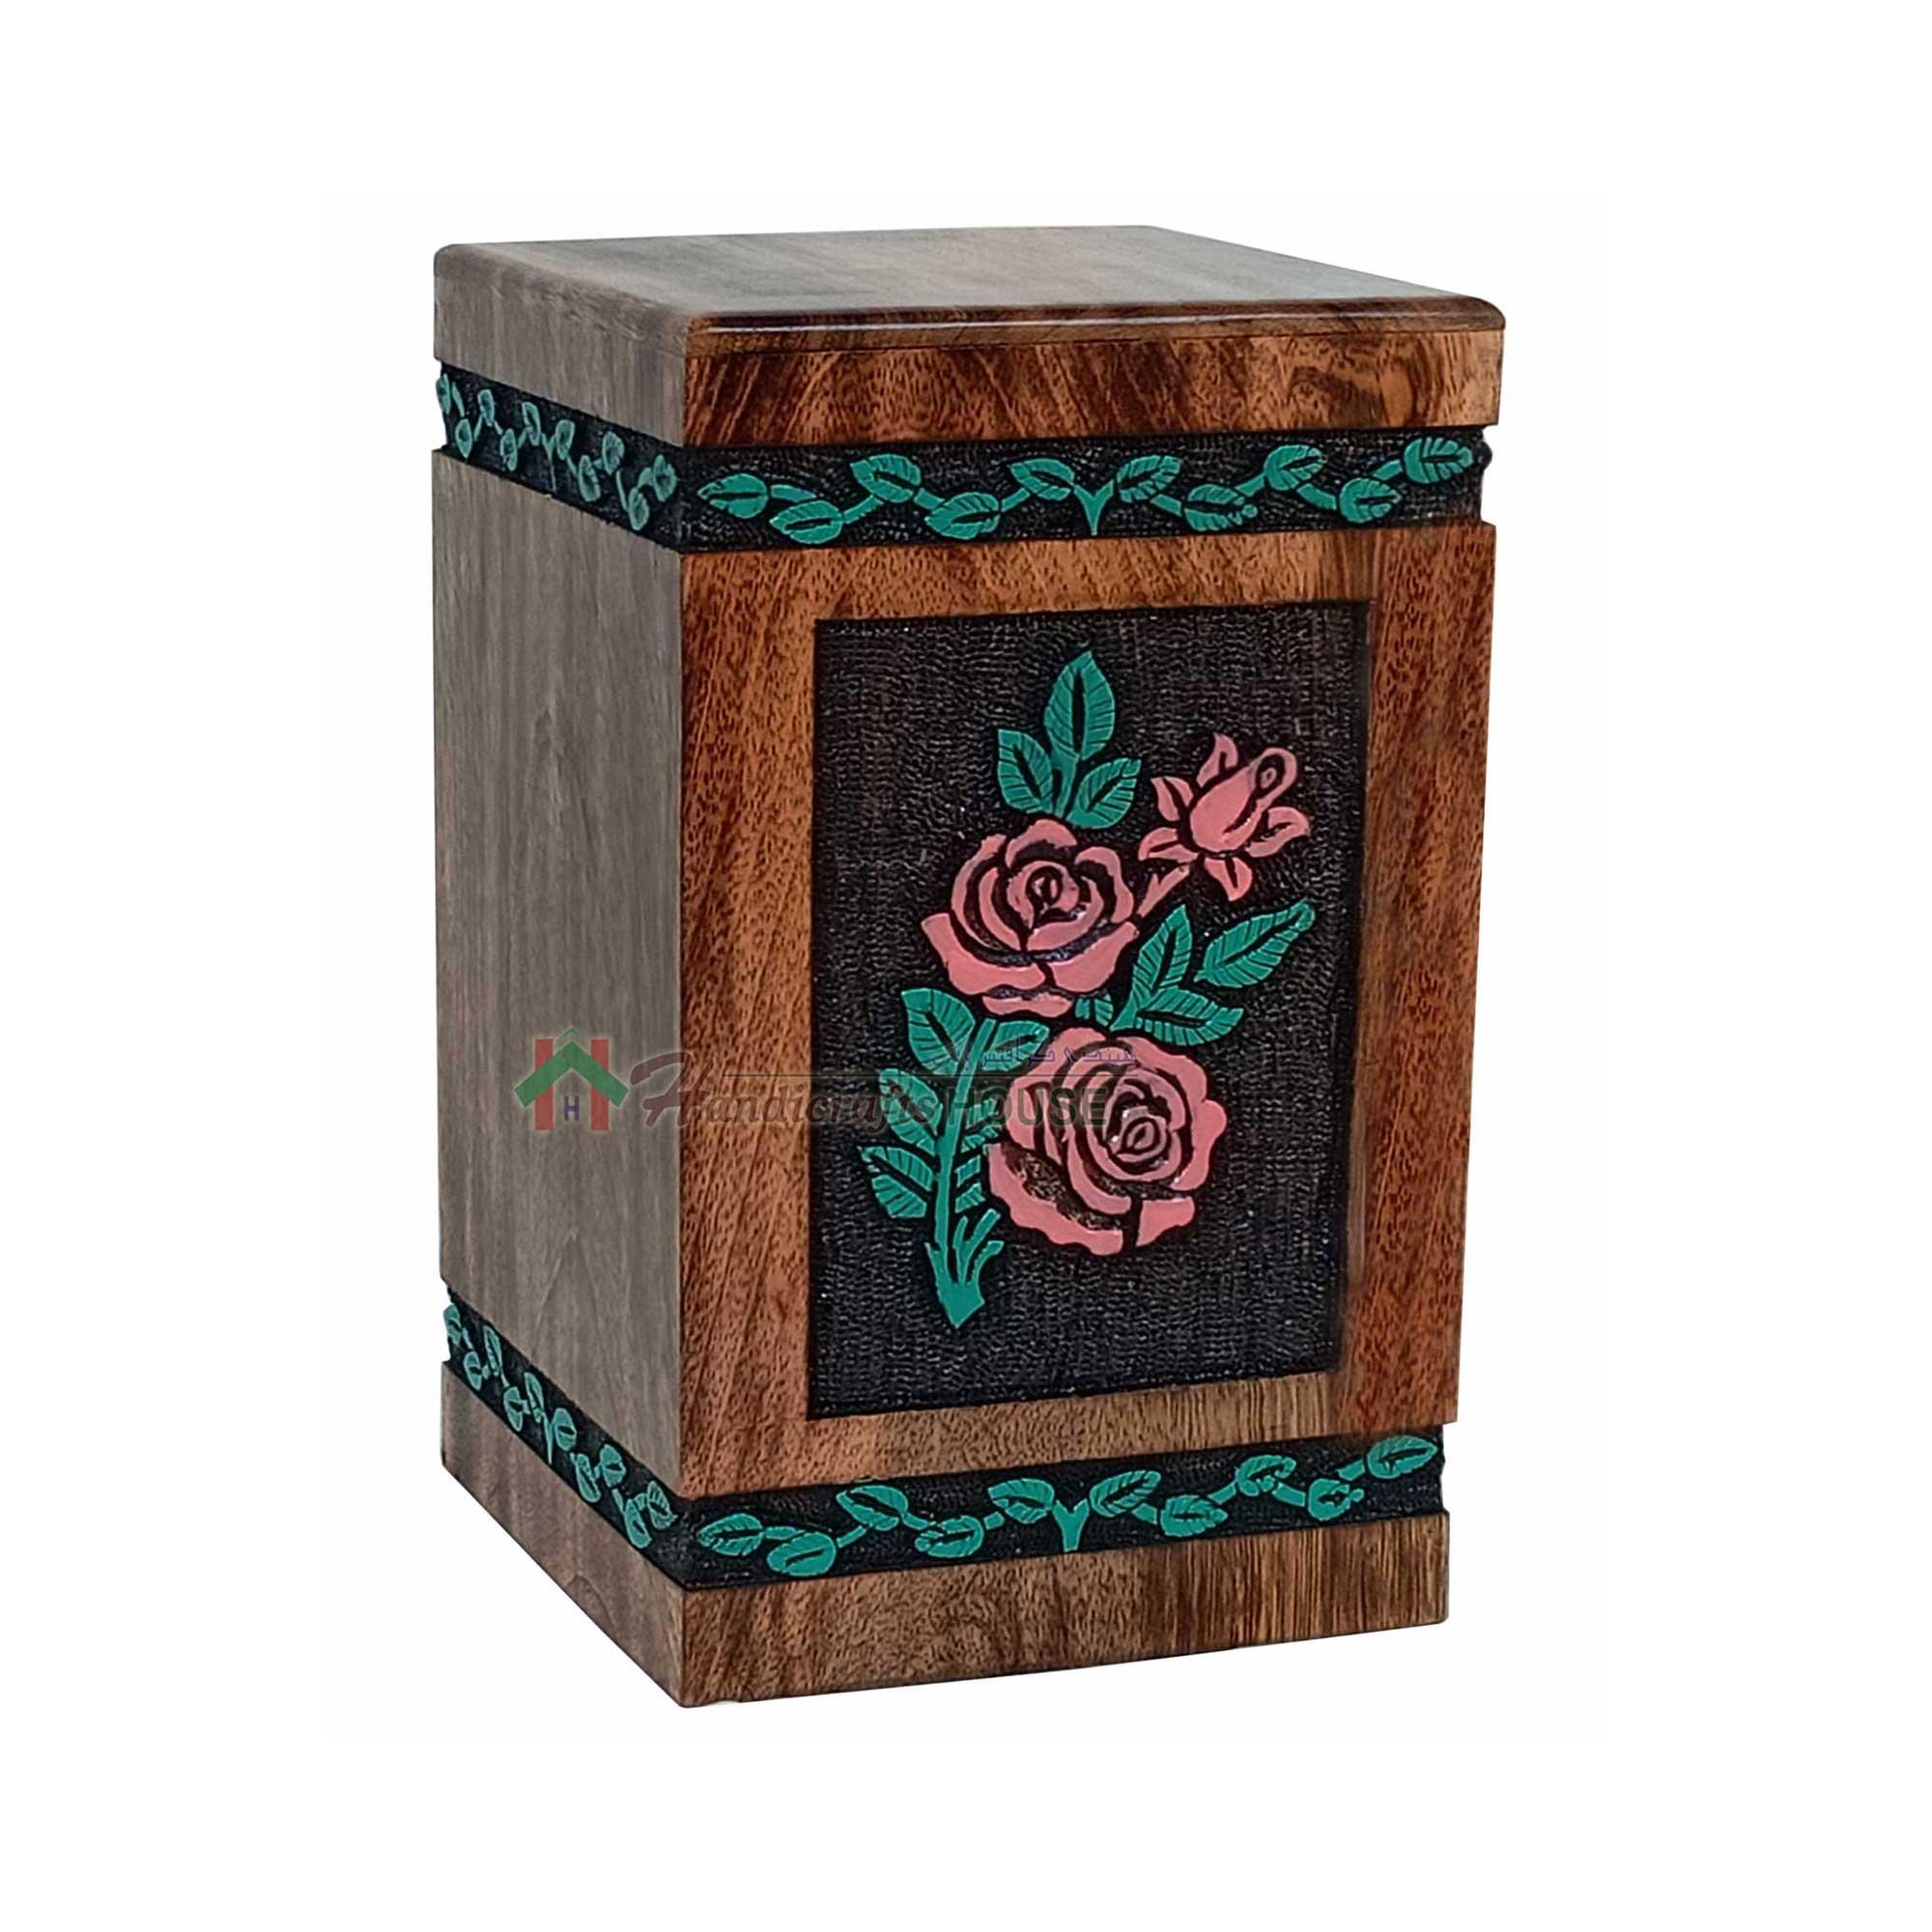 Rose Flower Hands Engraving Wooden Cremation Urns, Wood Funeral Urn for Human or Pet Ashes Adult - Hardwood Memorial Large Box 250 cu/in (Large)